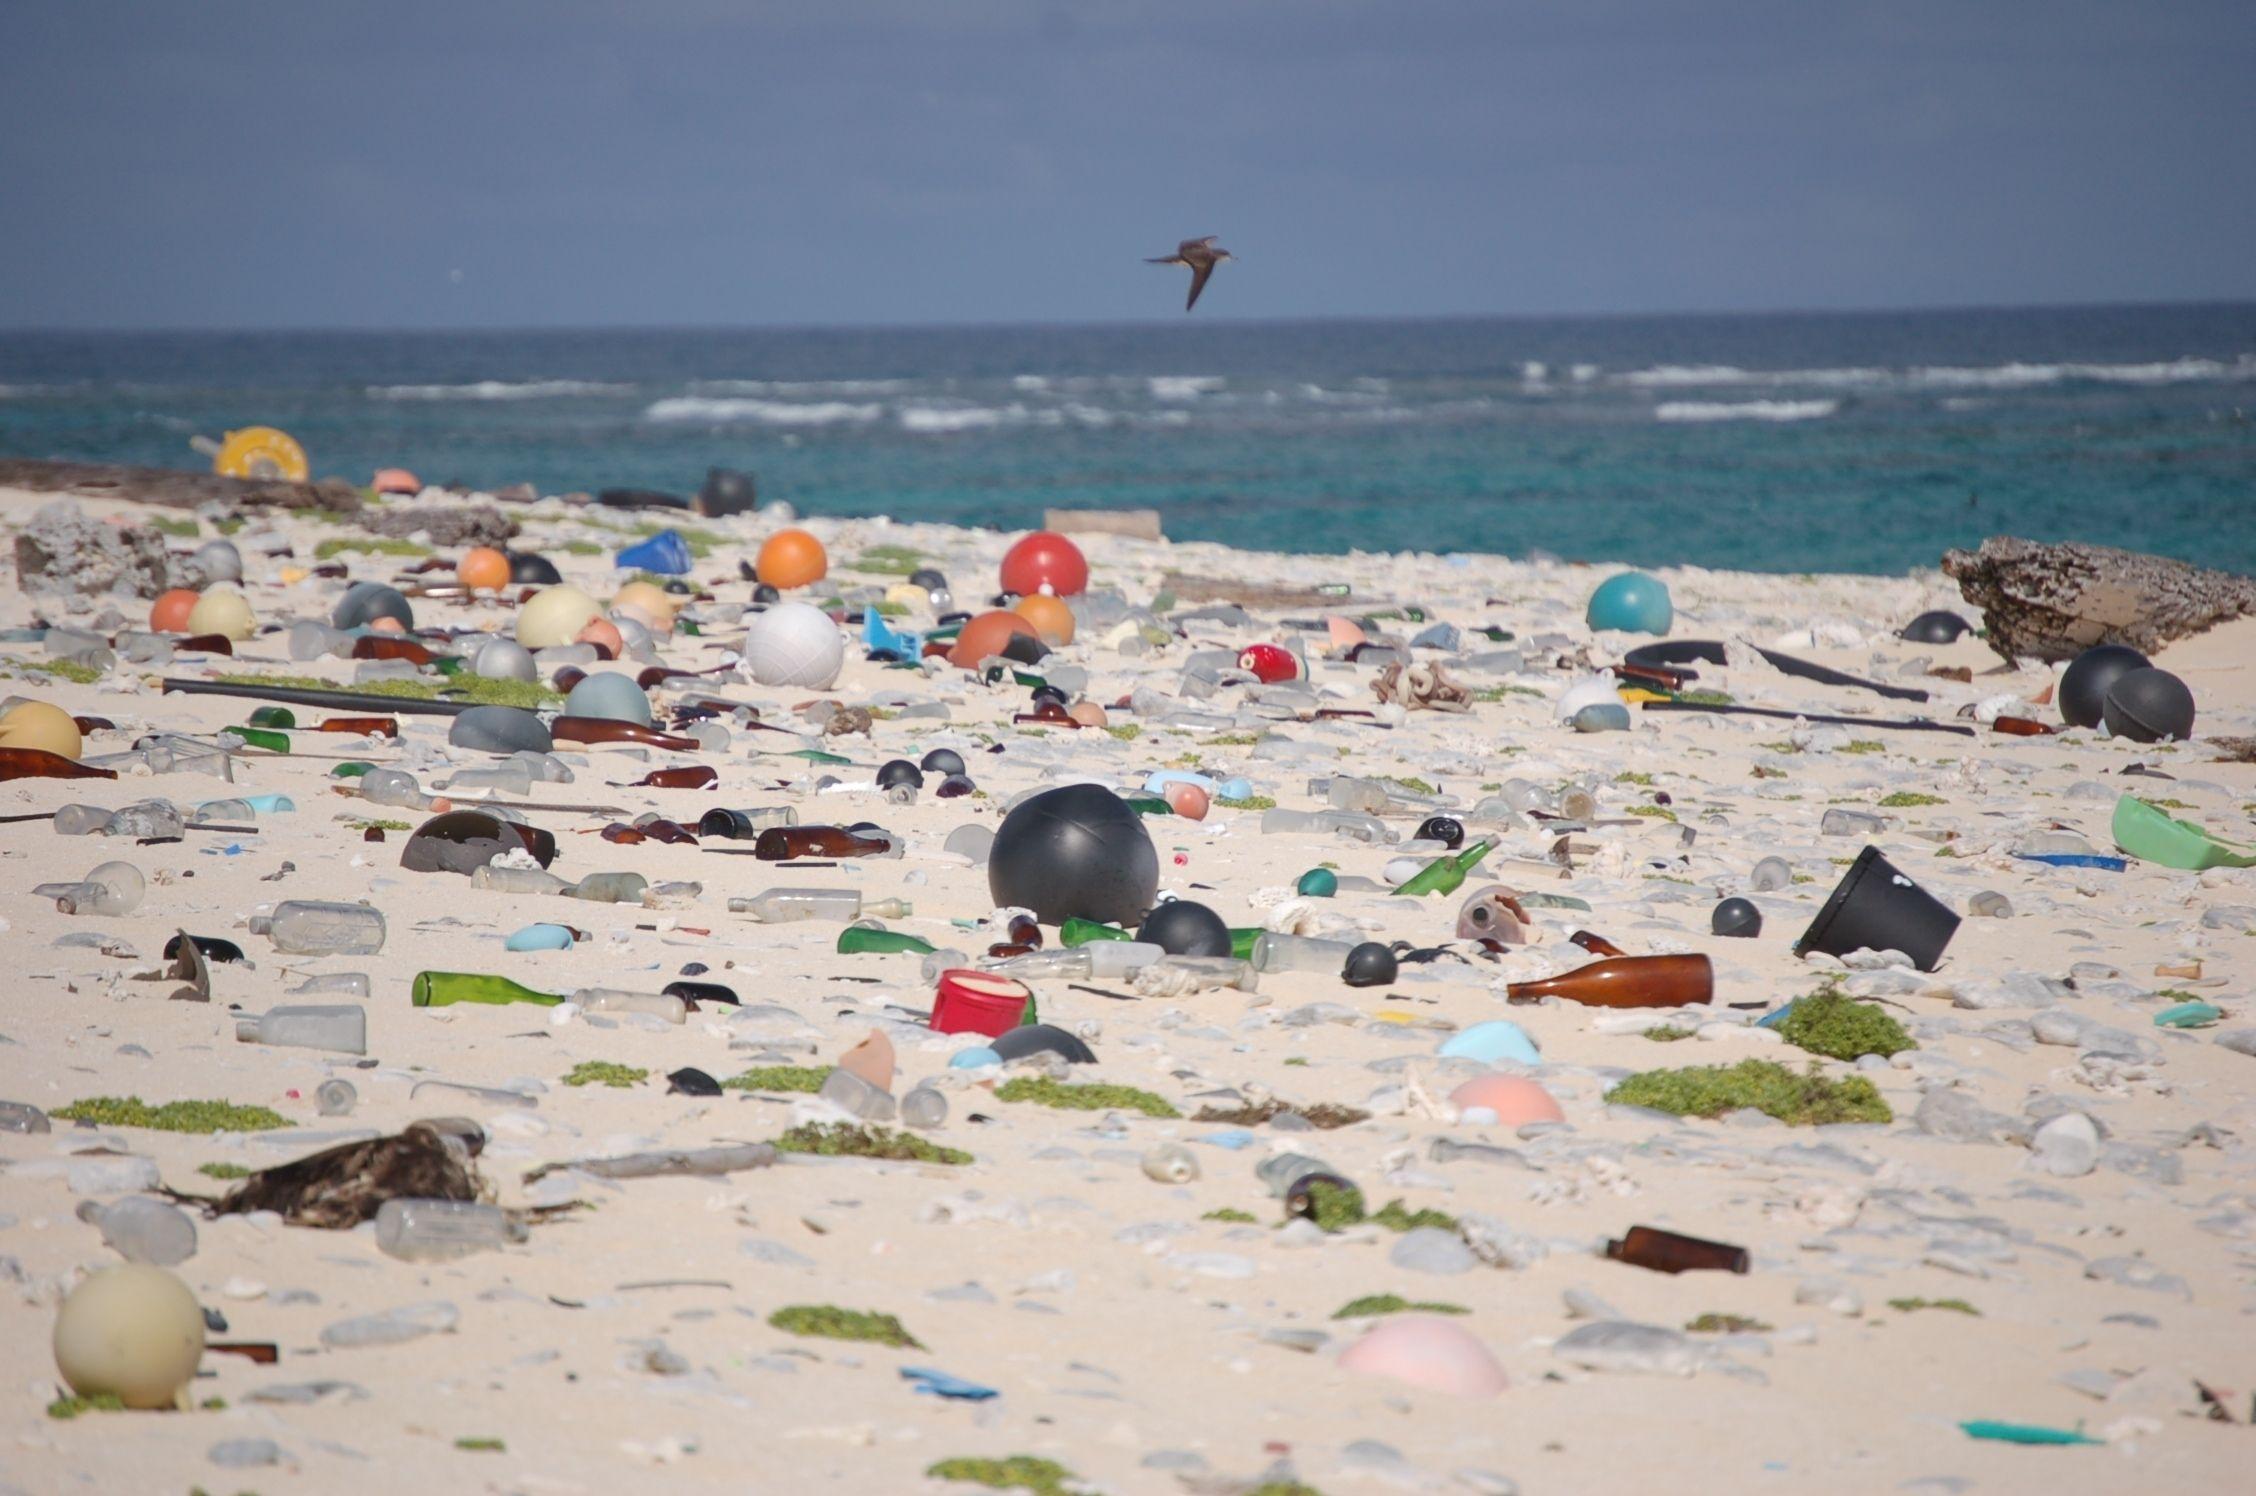 Marine life near Goa beaches degrading due to tar balls: Study